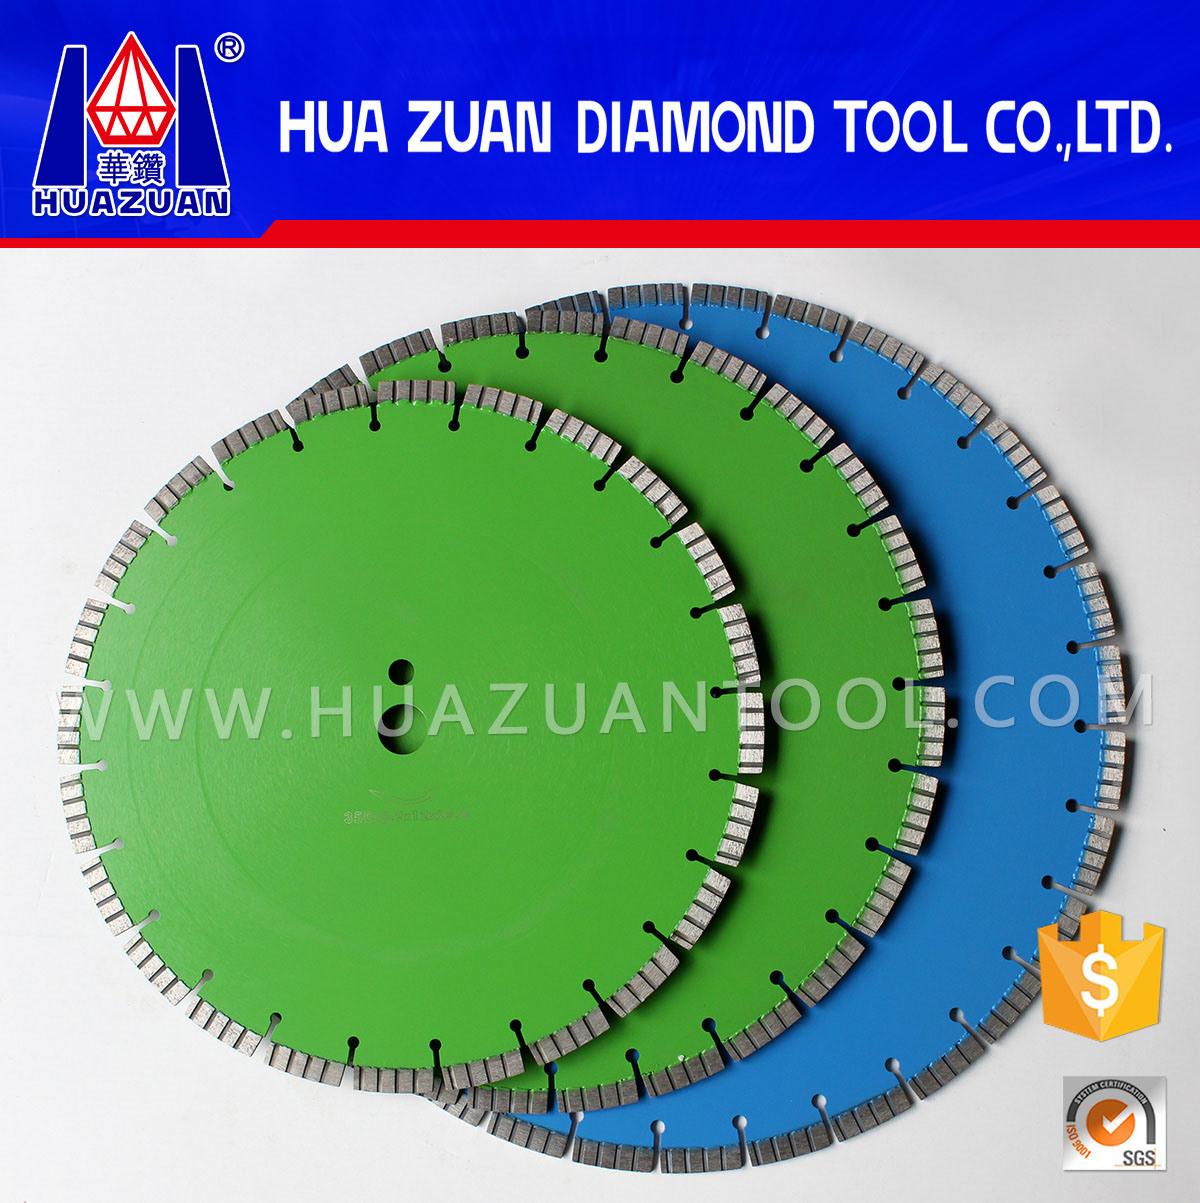 Diamond Concrete Saw Blades for Cutting Green Concrete